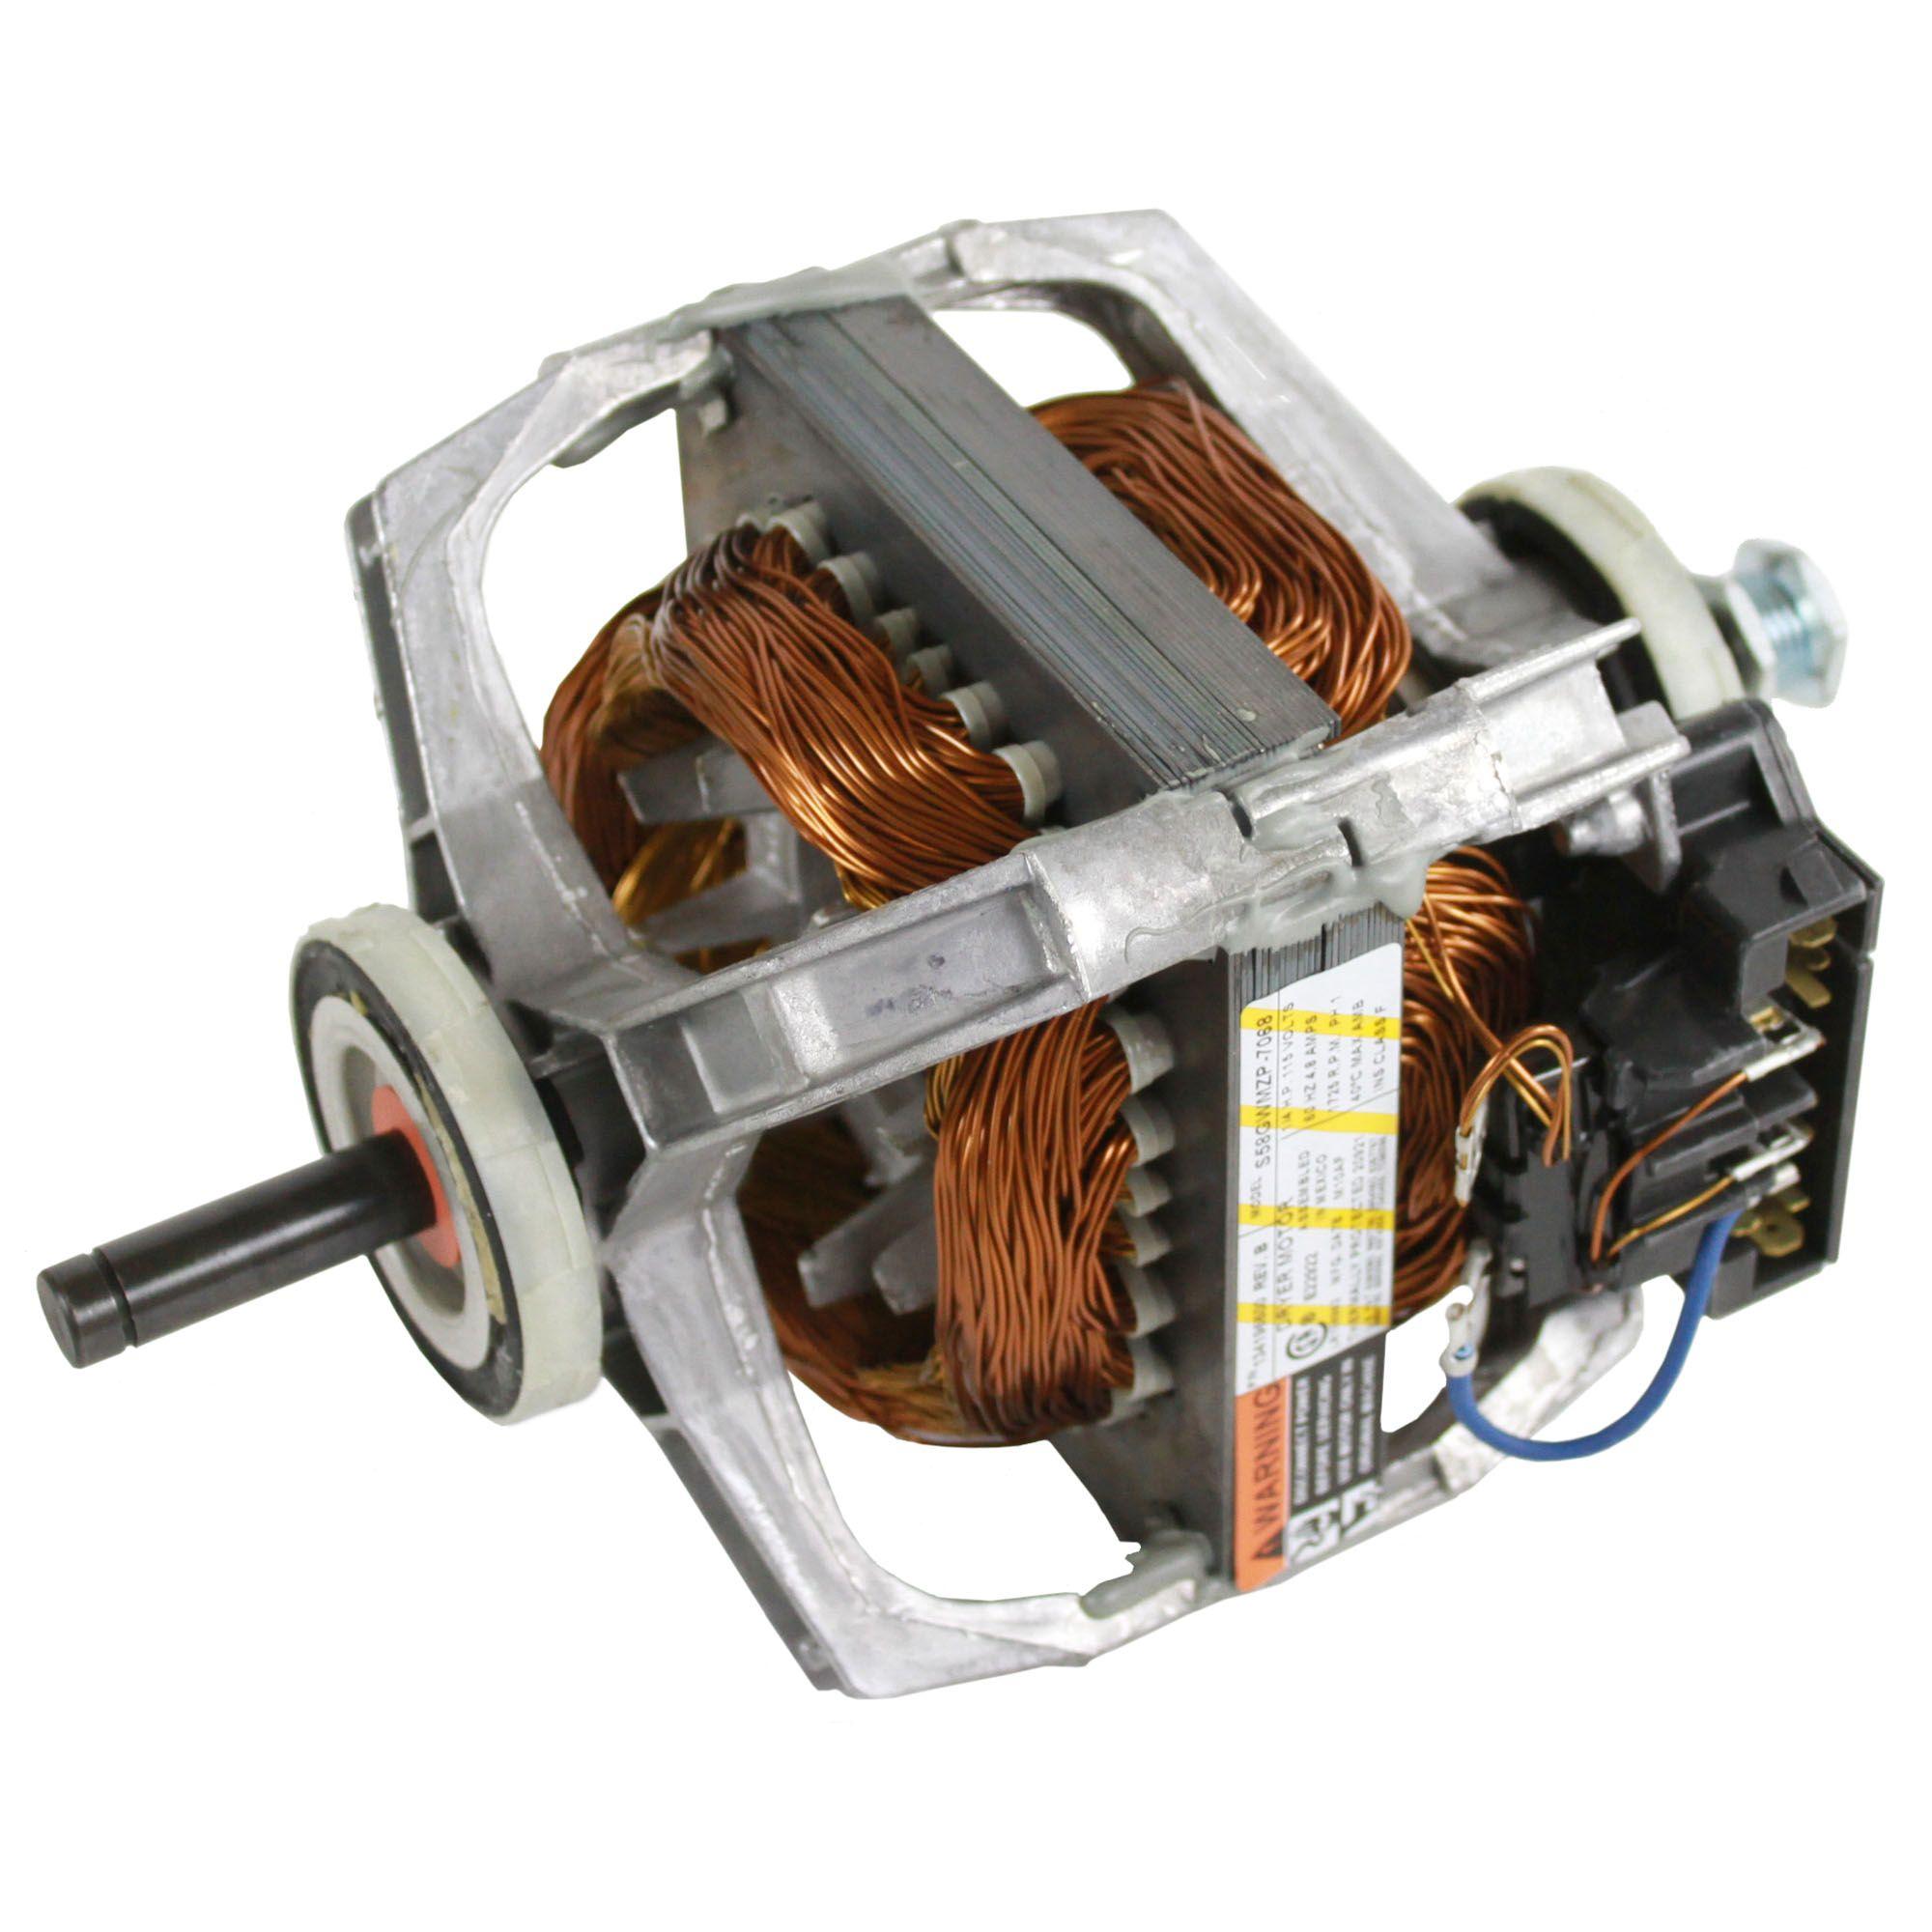 Common dryer problems - making noise or vibrating   Symptom